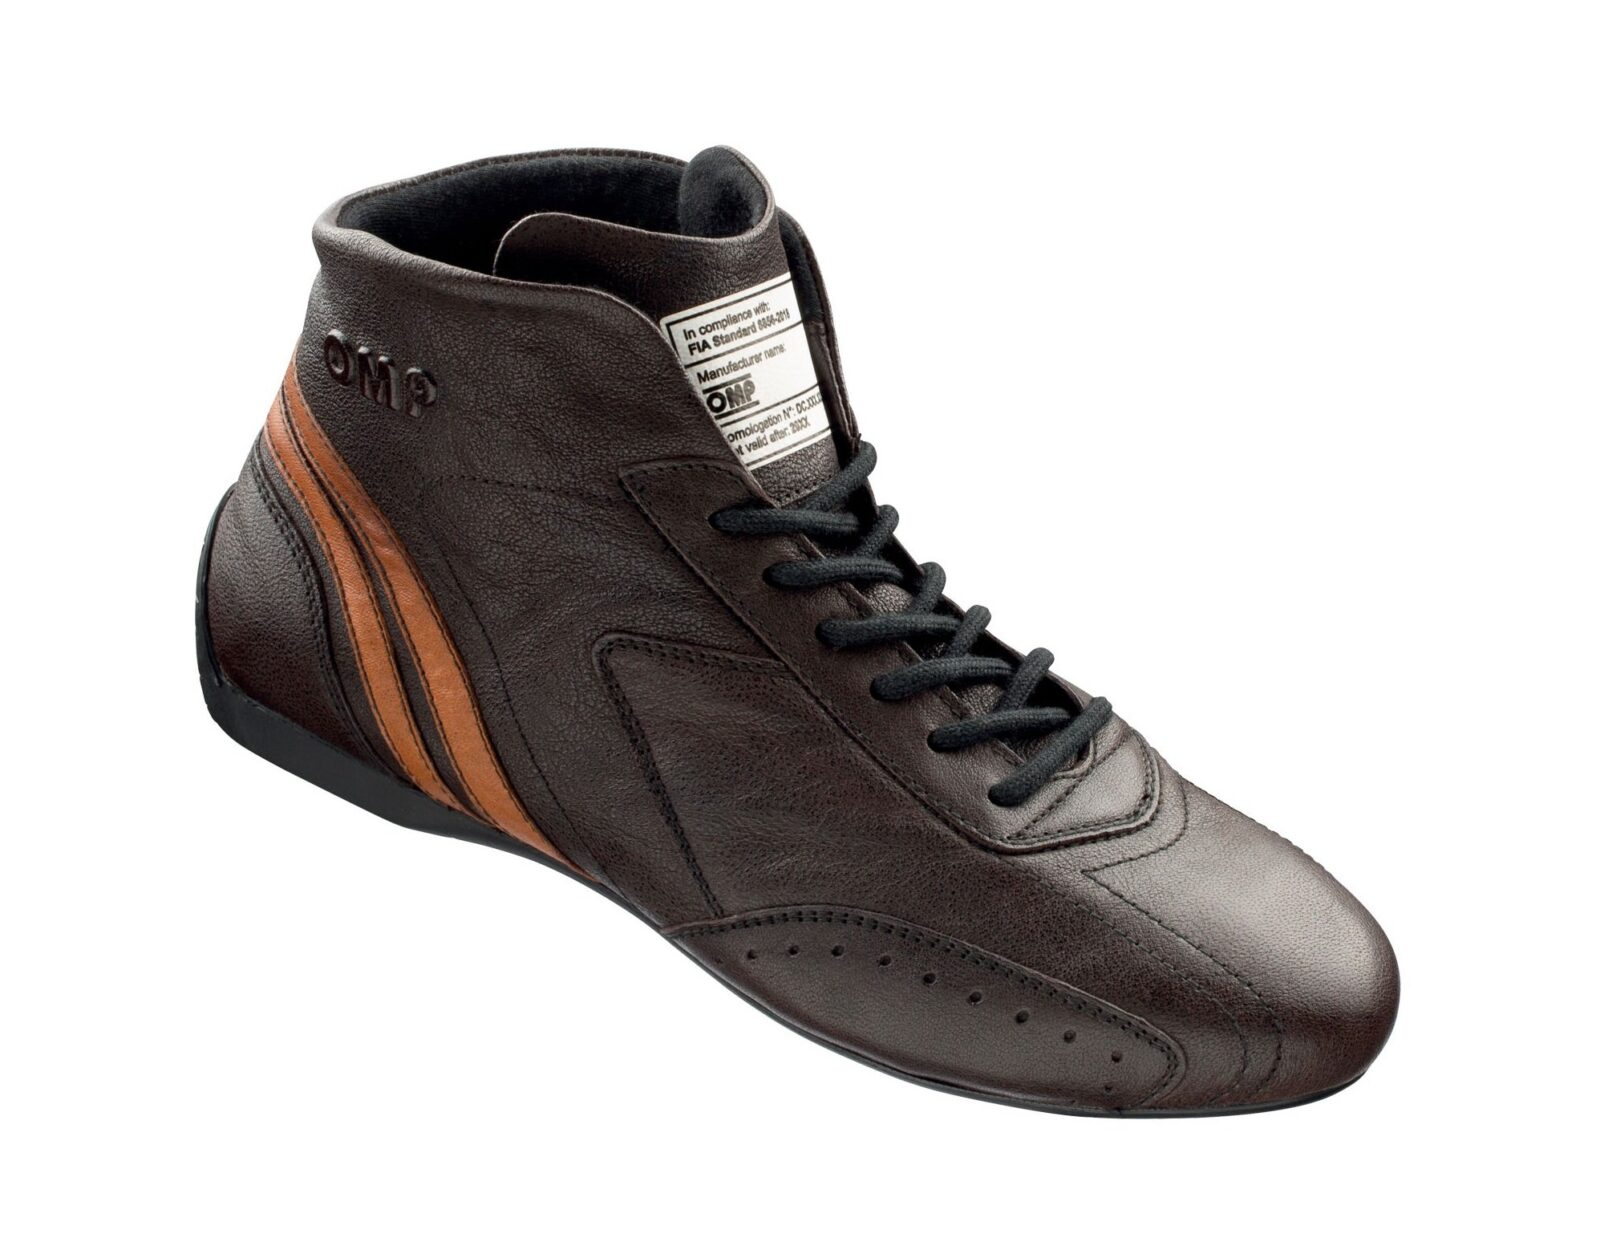 OMP Carrera Driving Shoes